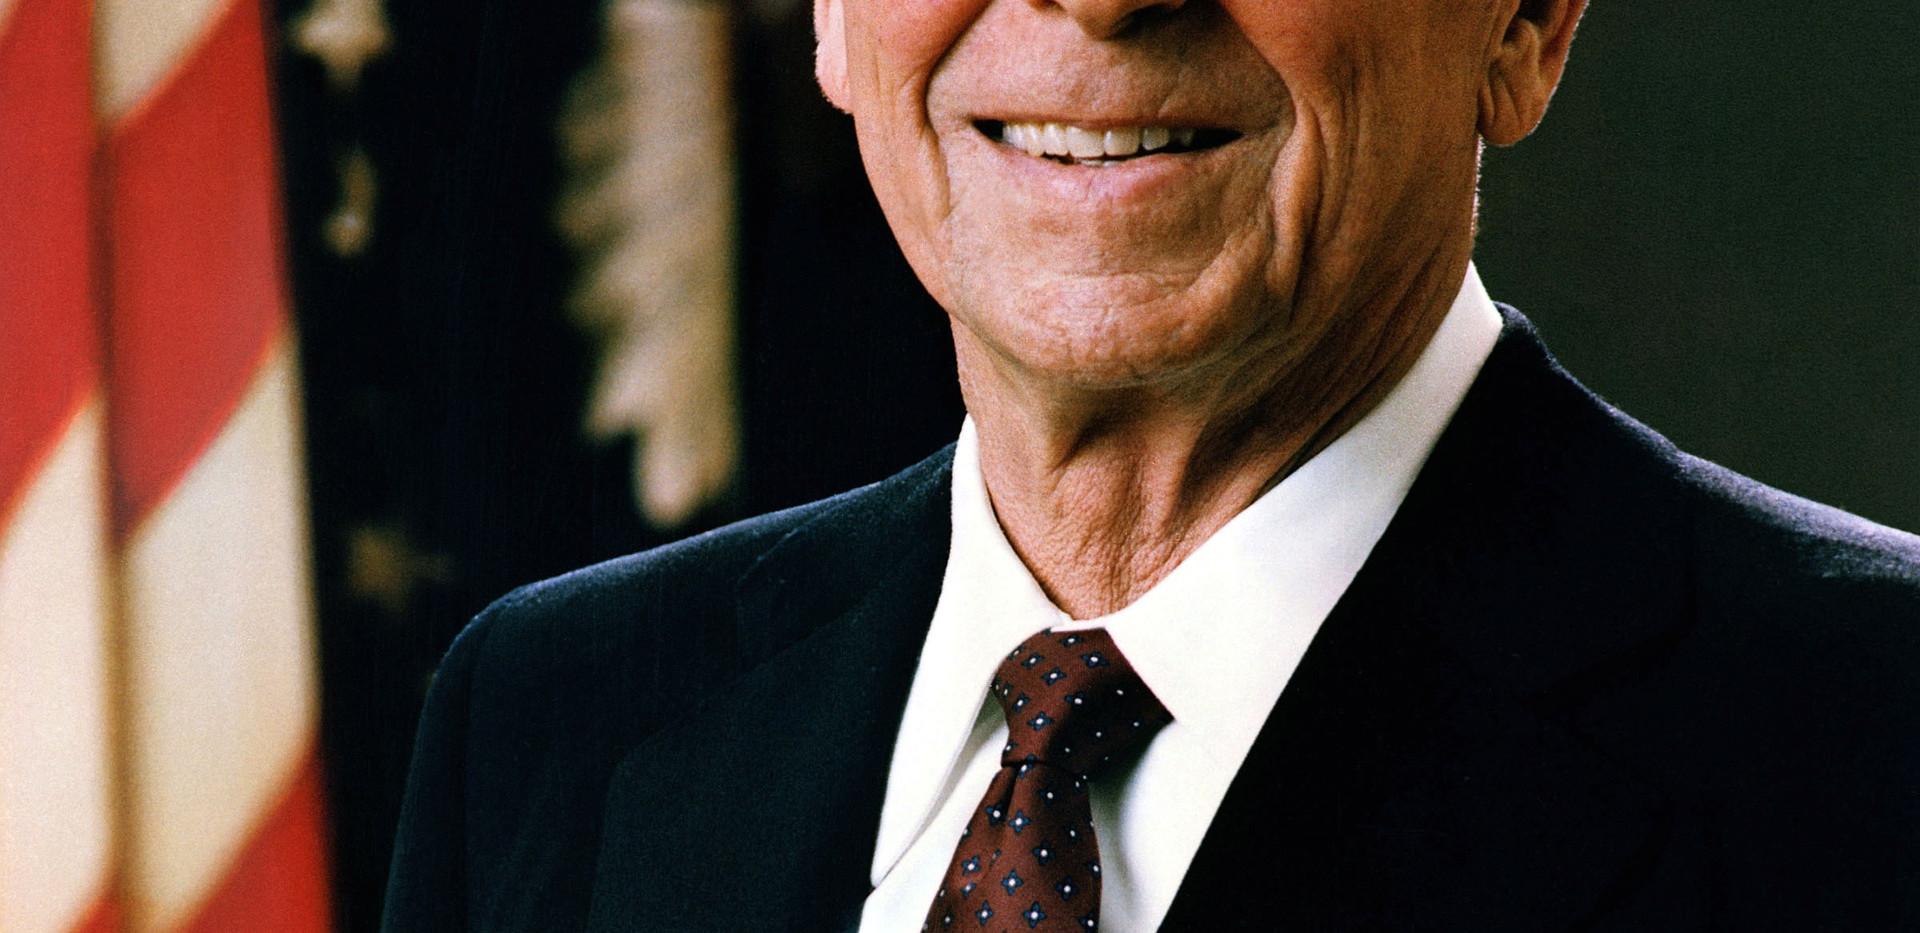 Ronald Reagan's presidential portrait